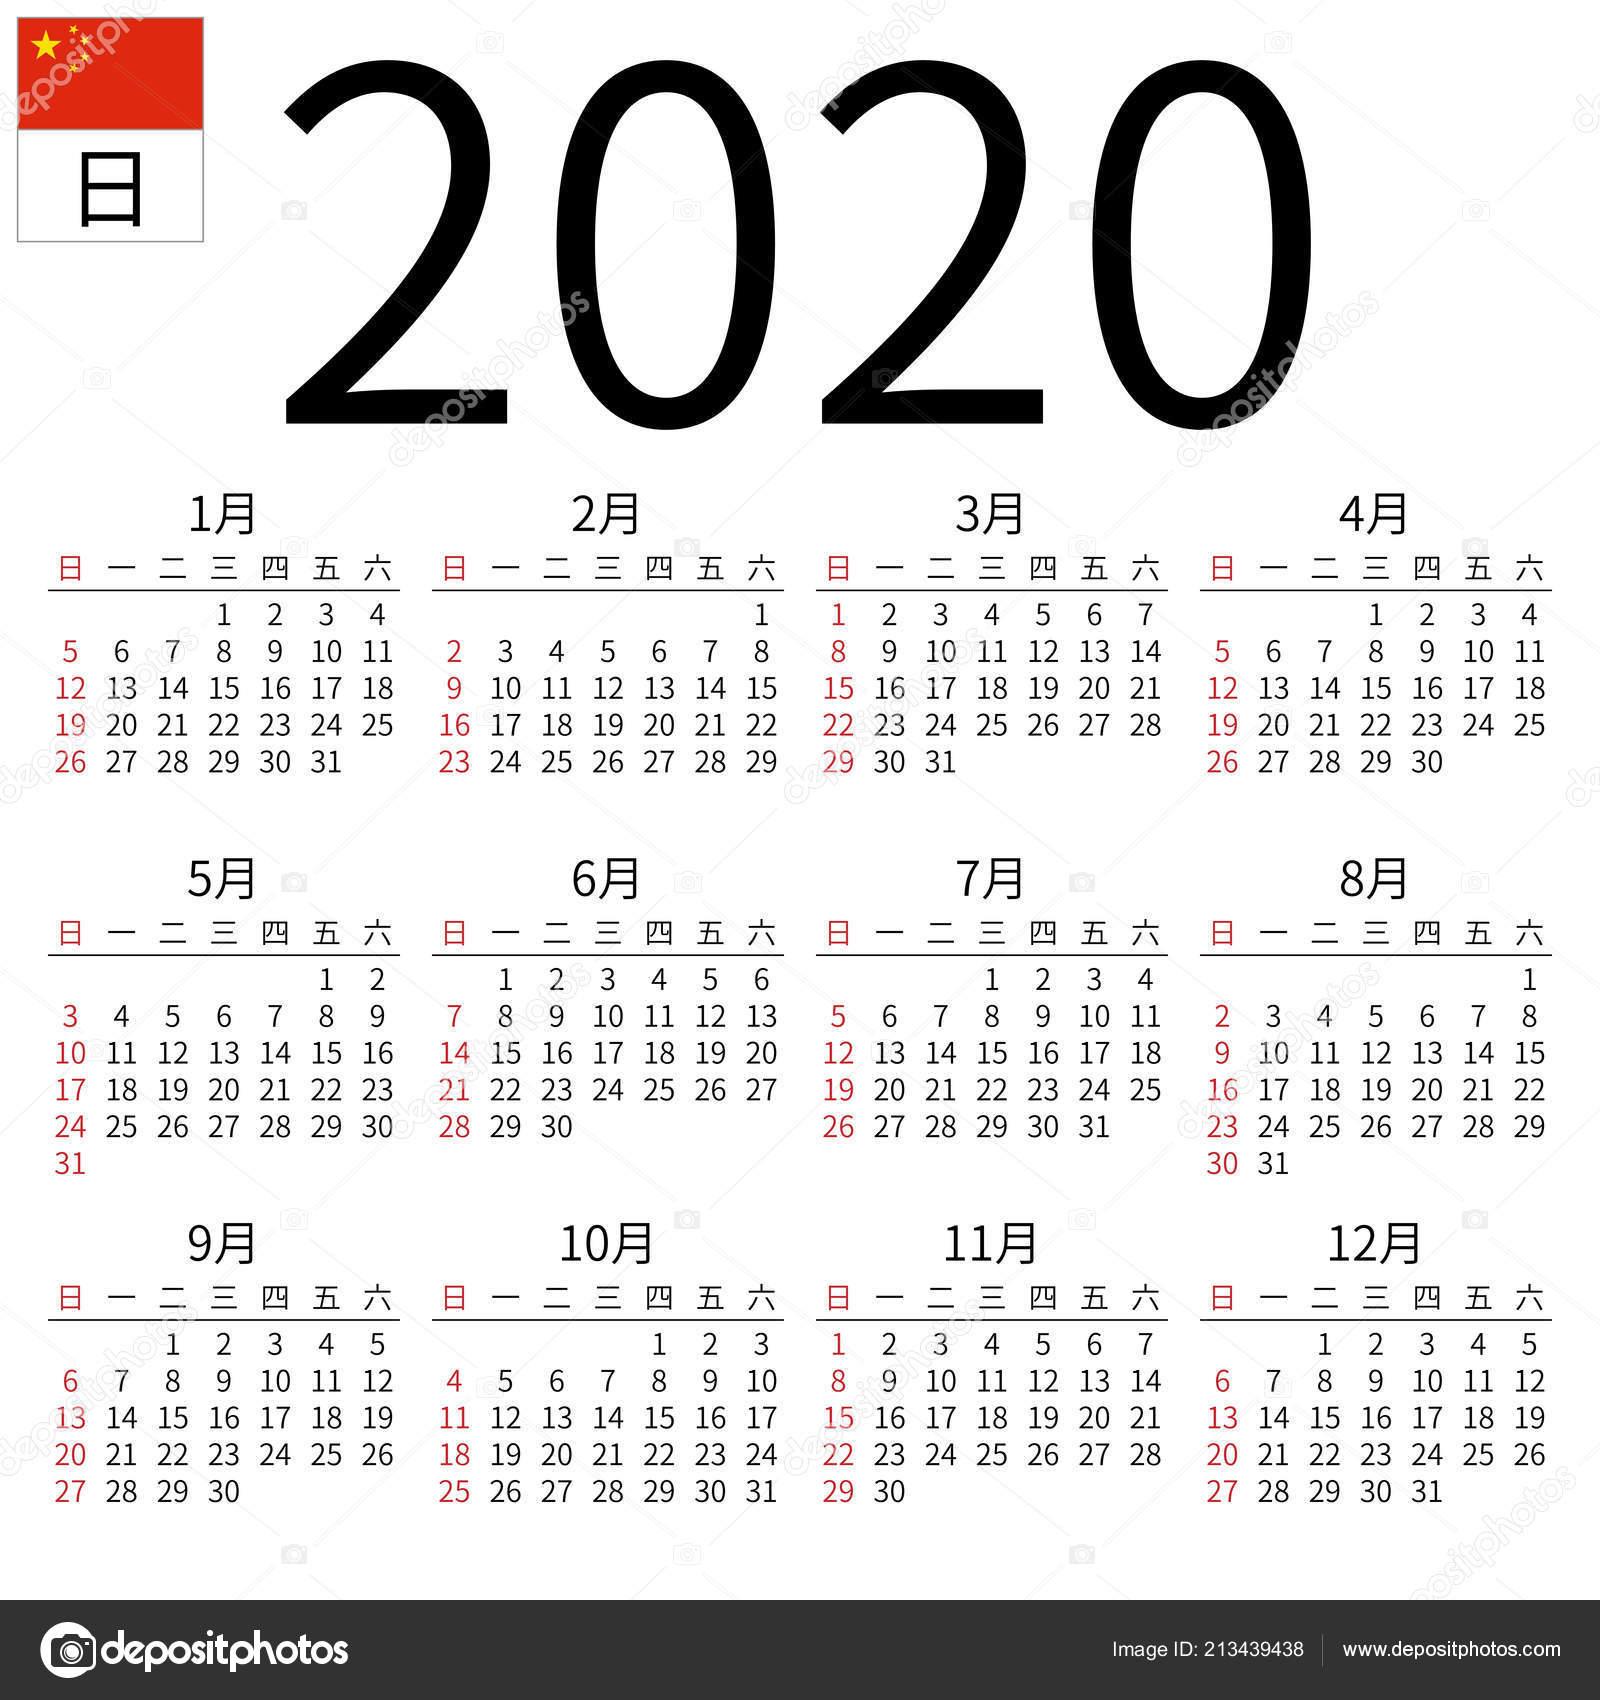 Calendario Cinese 2020.Calendario Parete Semplice Annuale Anno 2020 Lingua Cinese